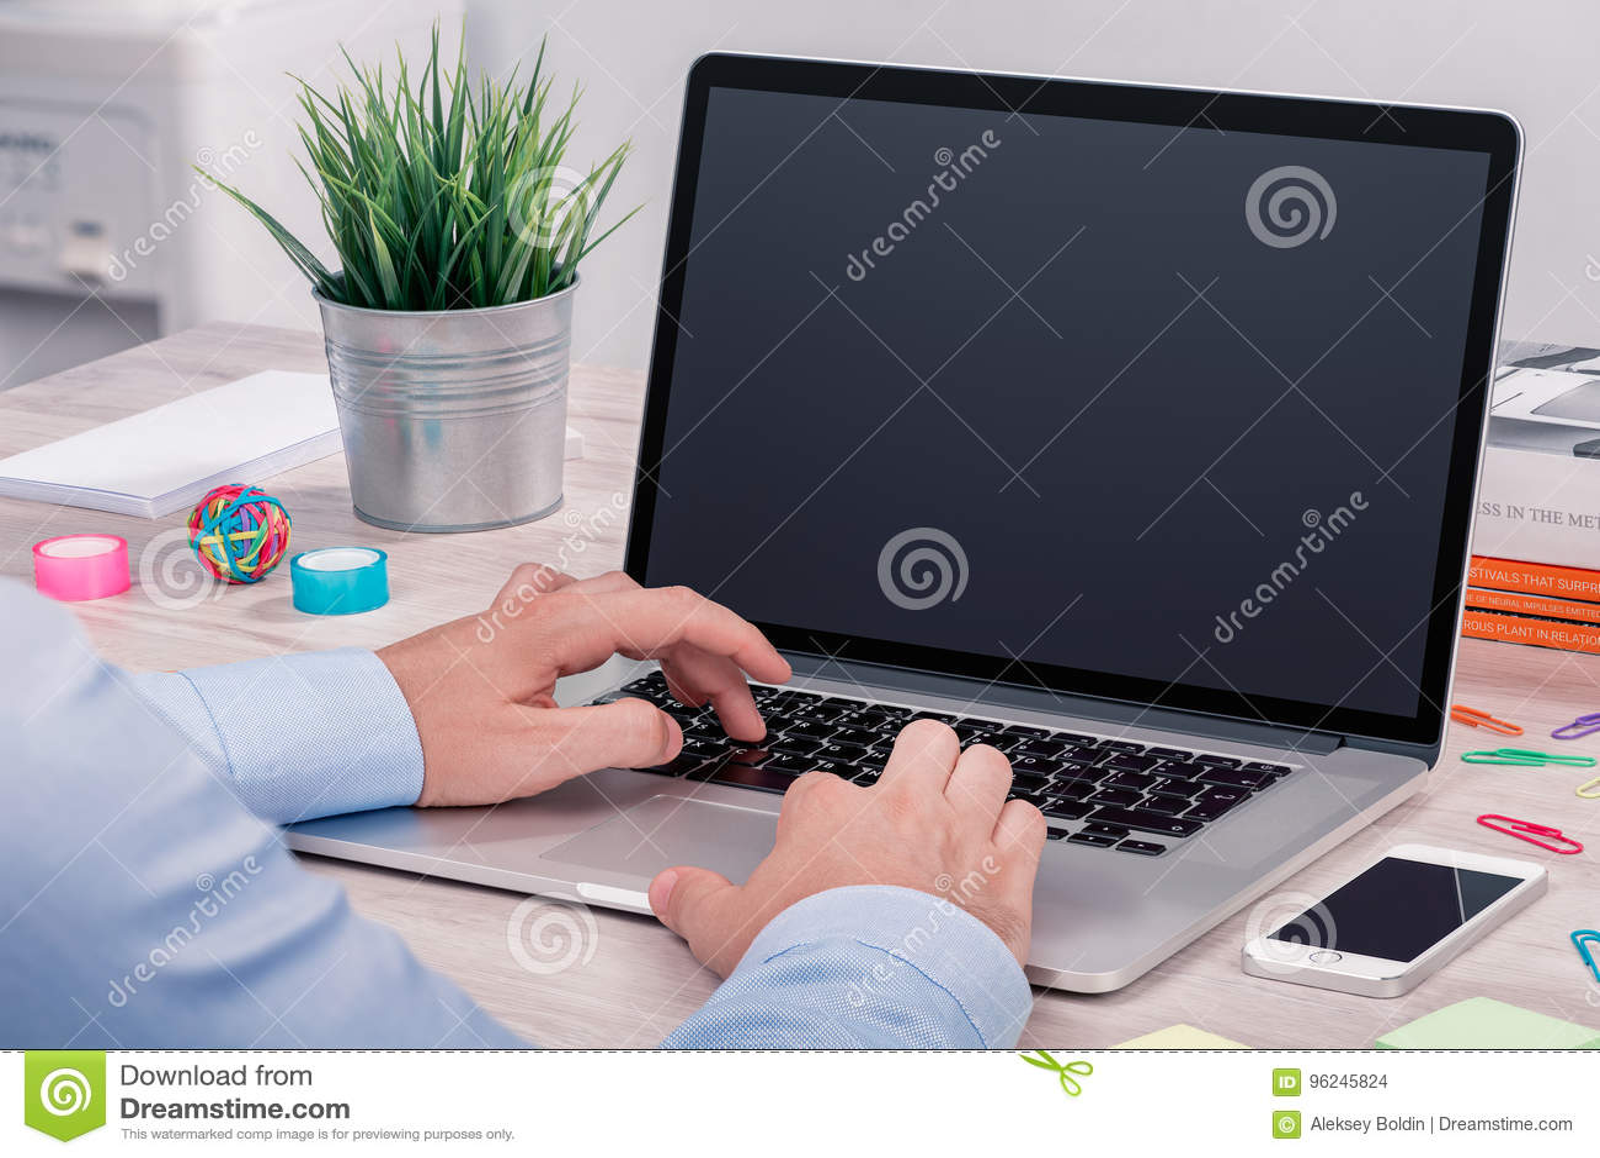 Mans hands keyboarding on macbook laptop with blank screen mockup